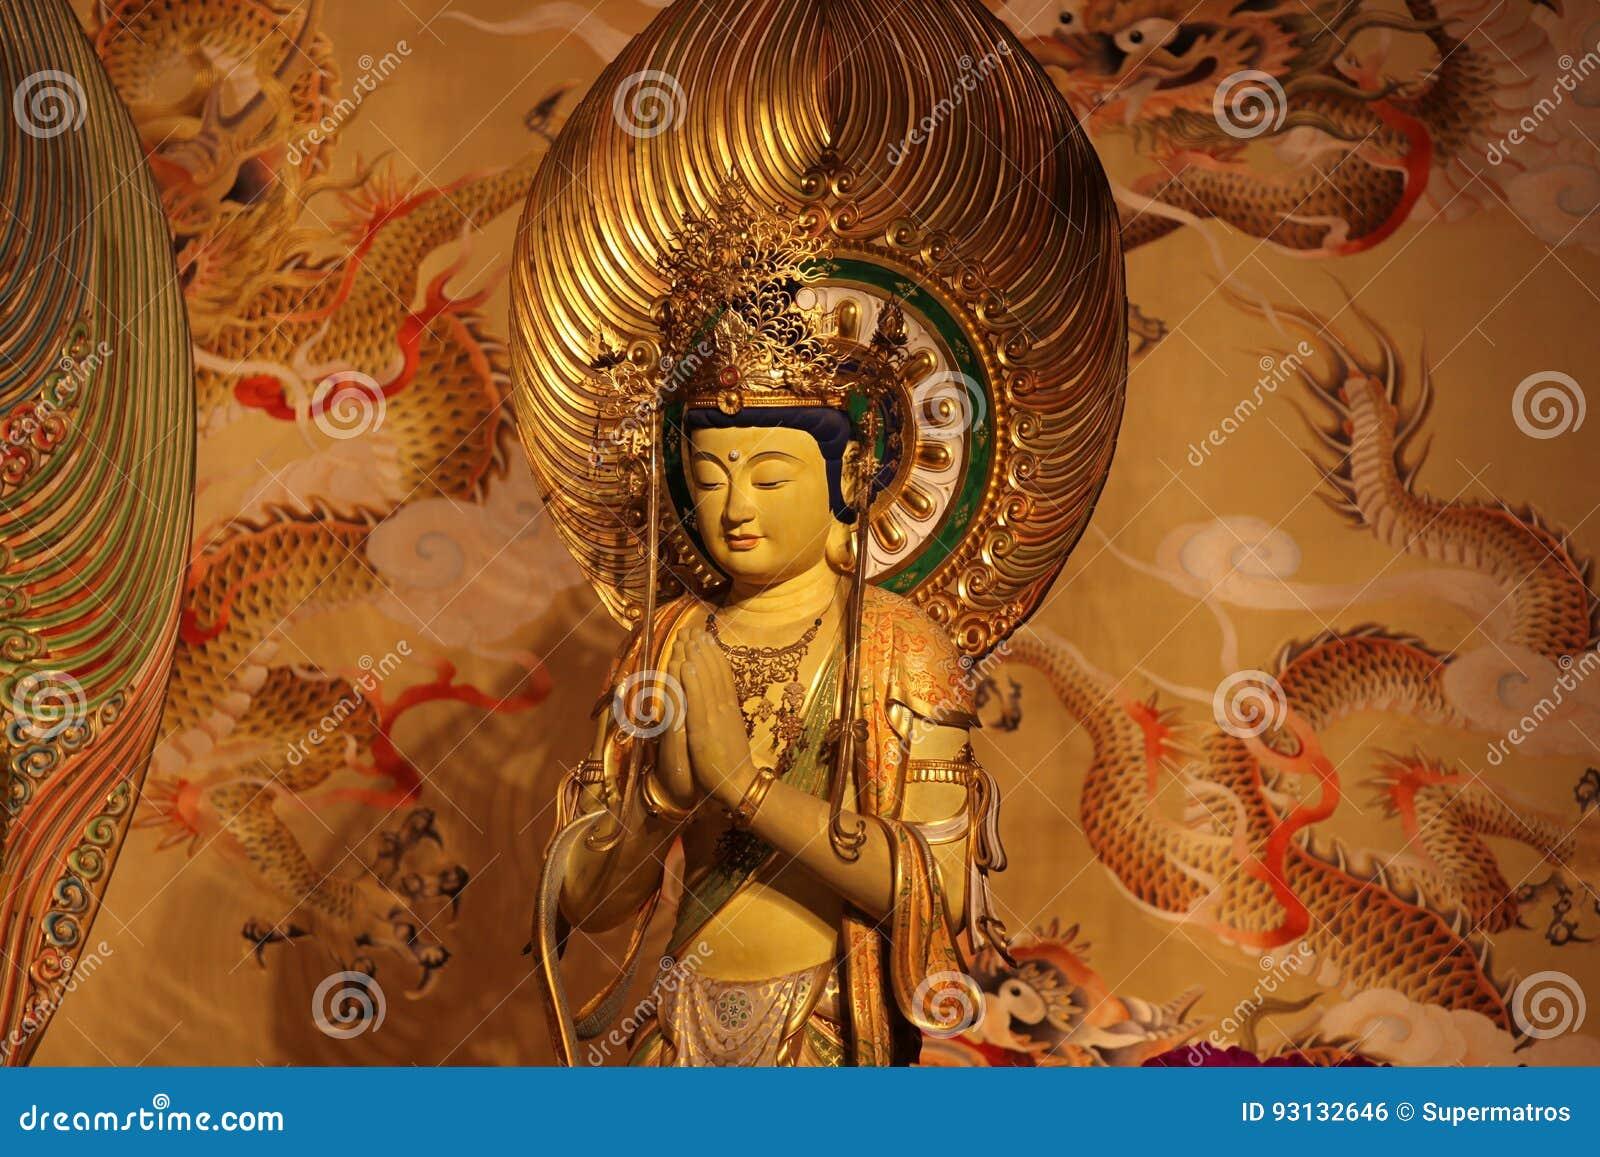 Beeldhouwwerk, architectuur en symbolen van Hindoeïsme en Boeddhisme